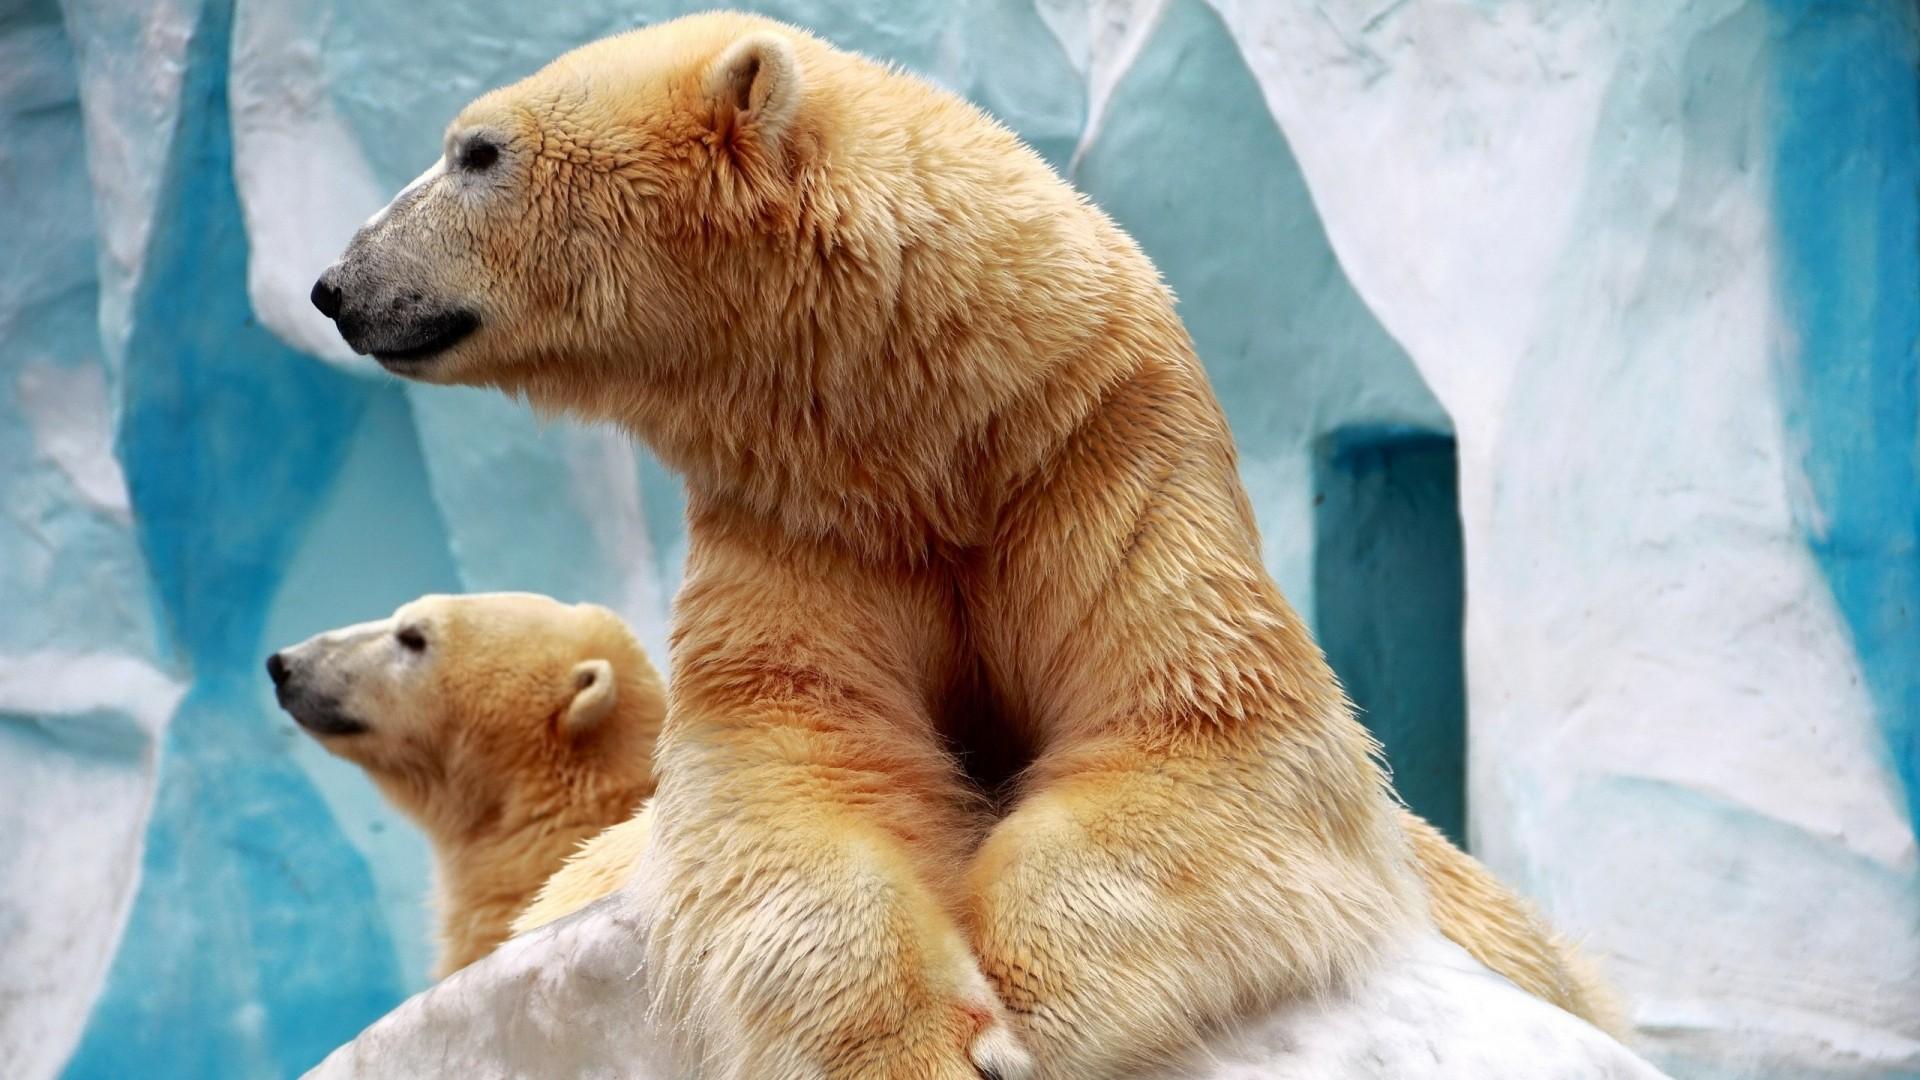 Polar Bear hd wallpaper download